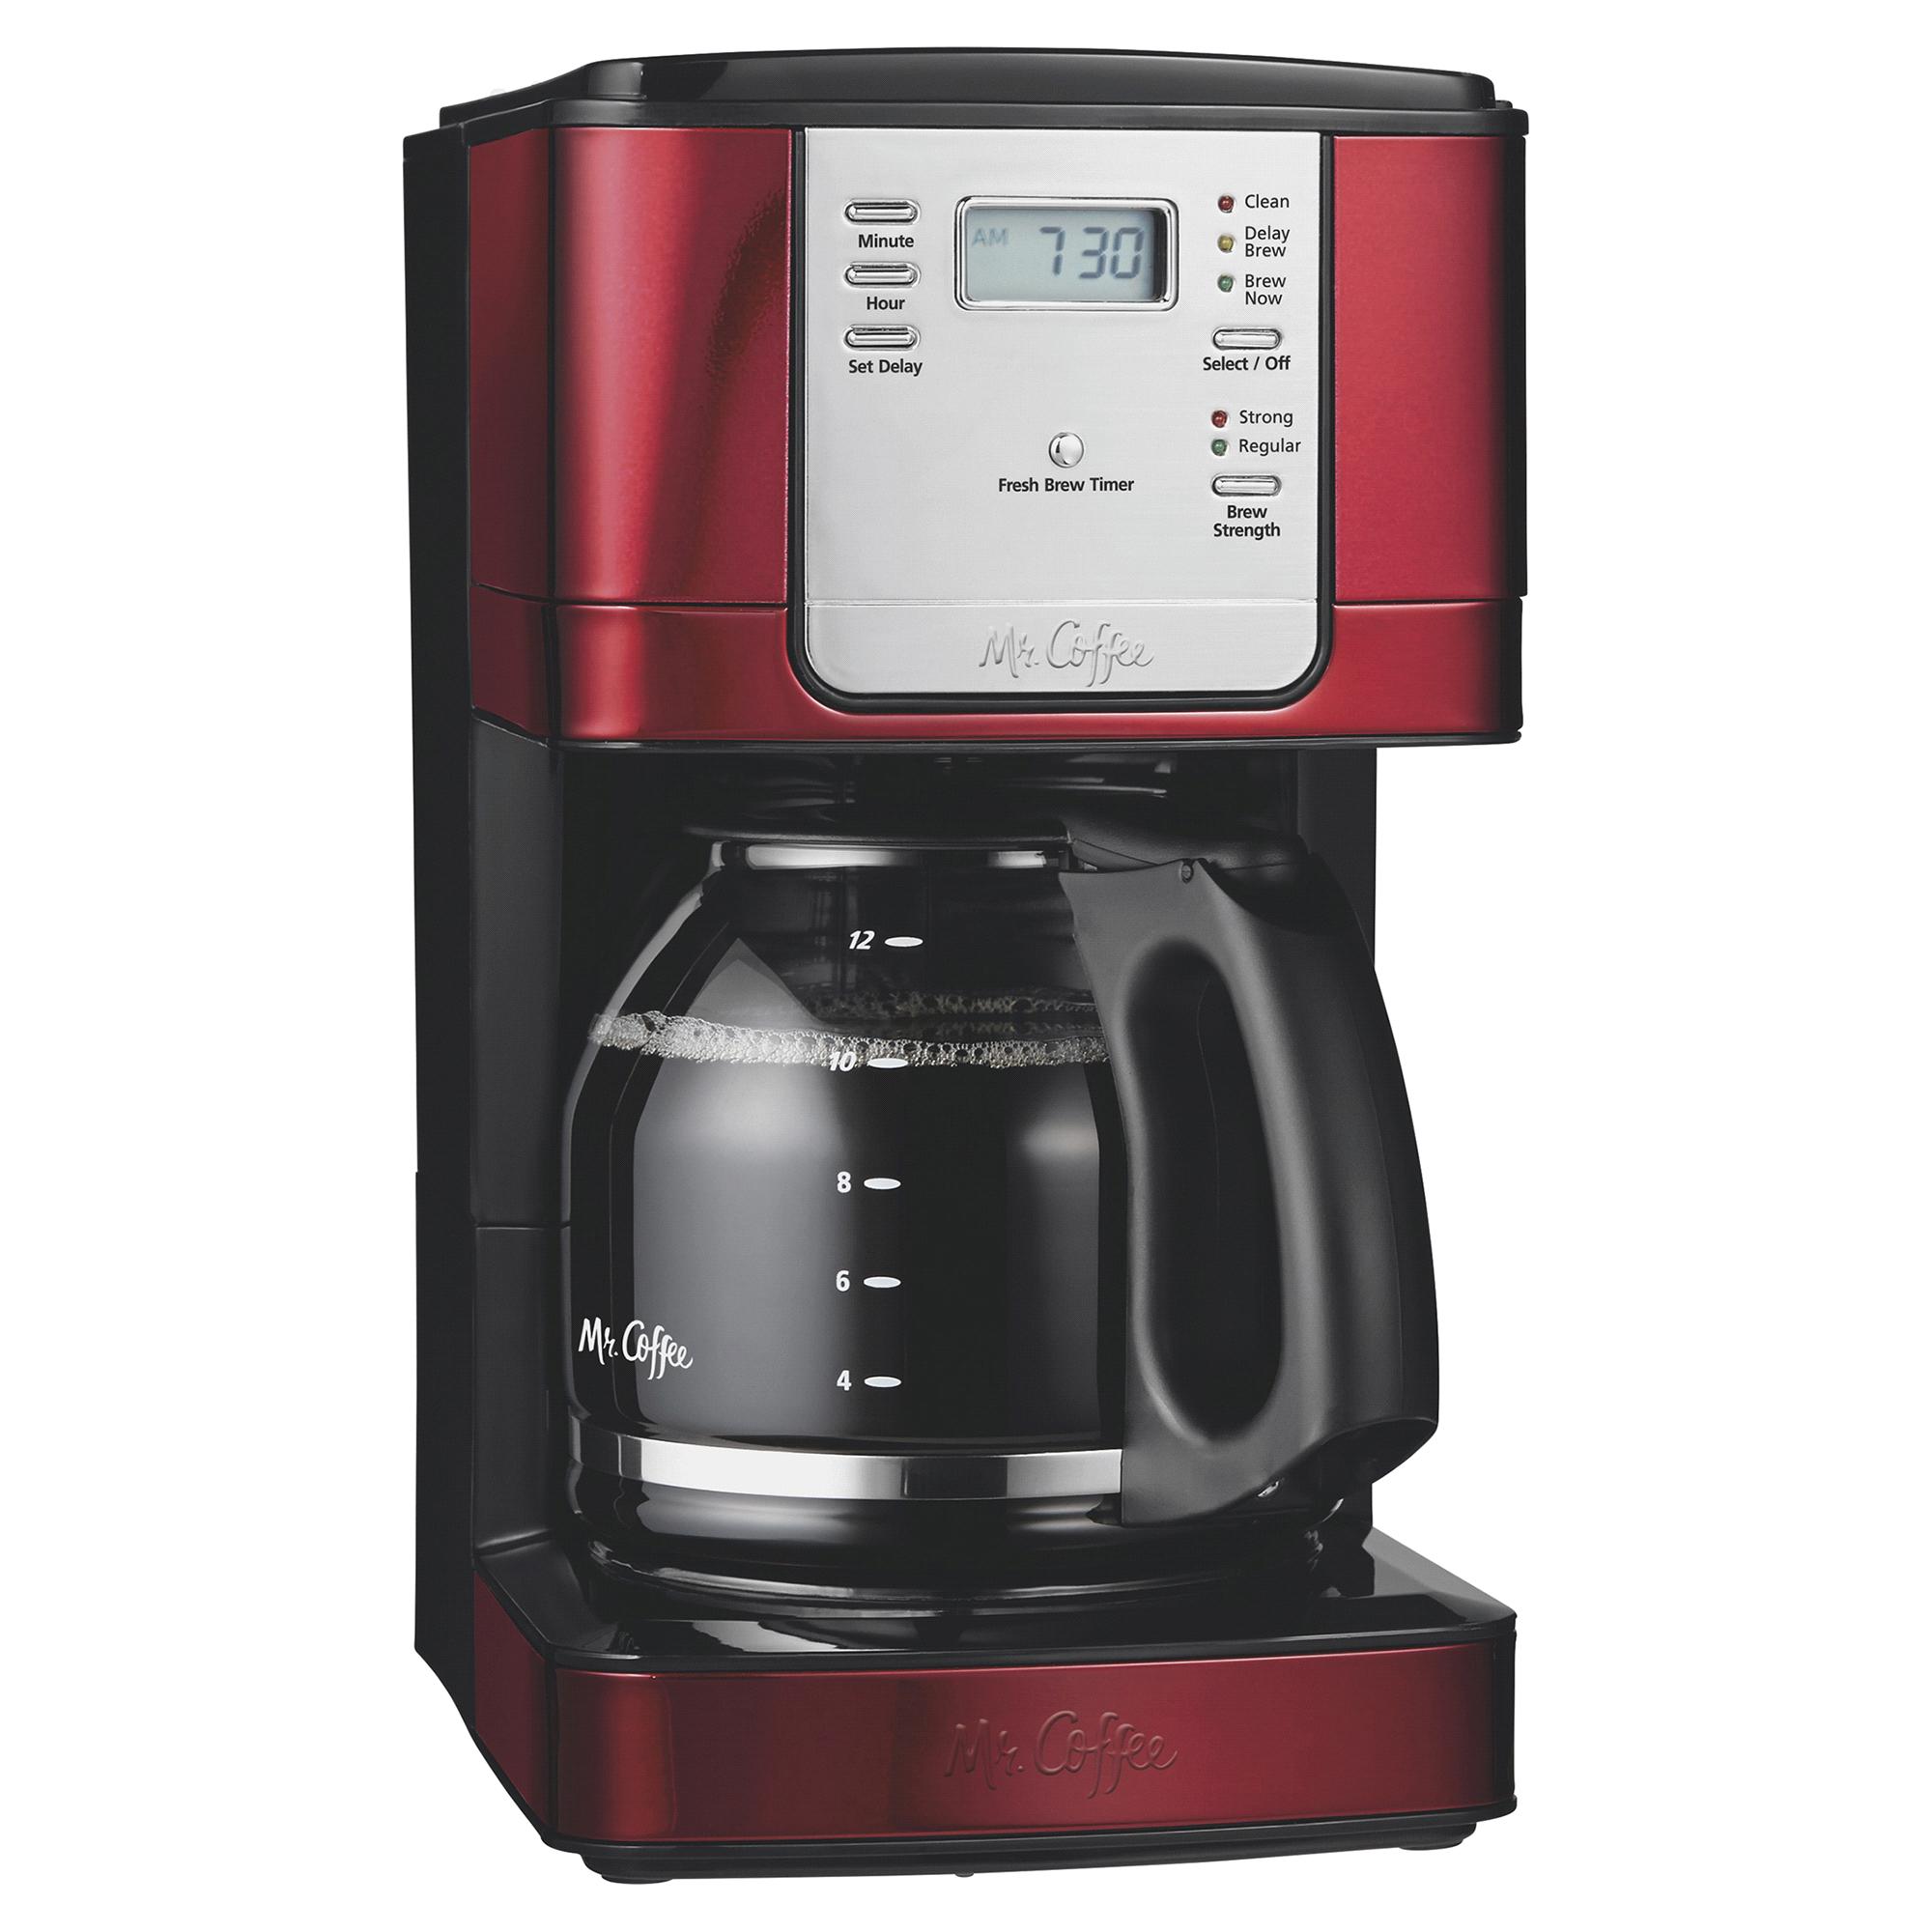 Mr Coffee 12 Cup Coffeemaker Metallic Red Meijercom